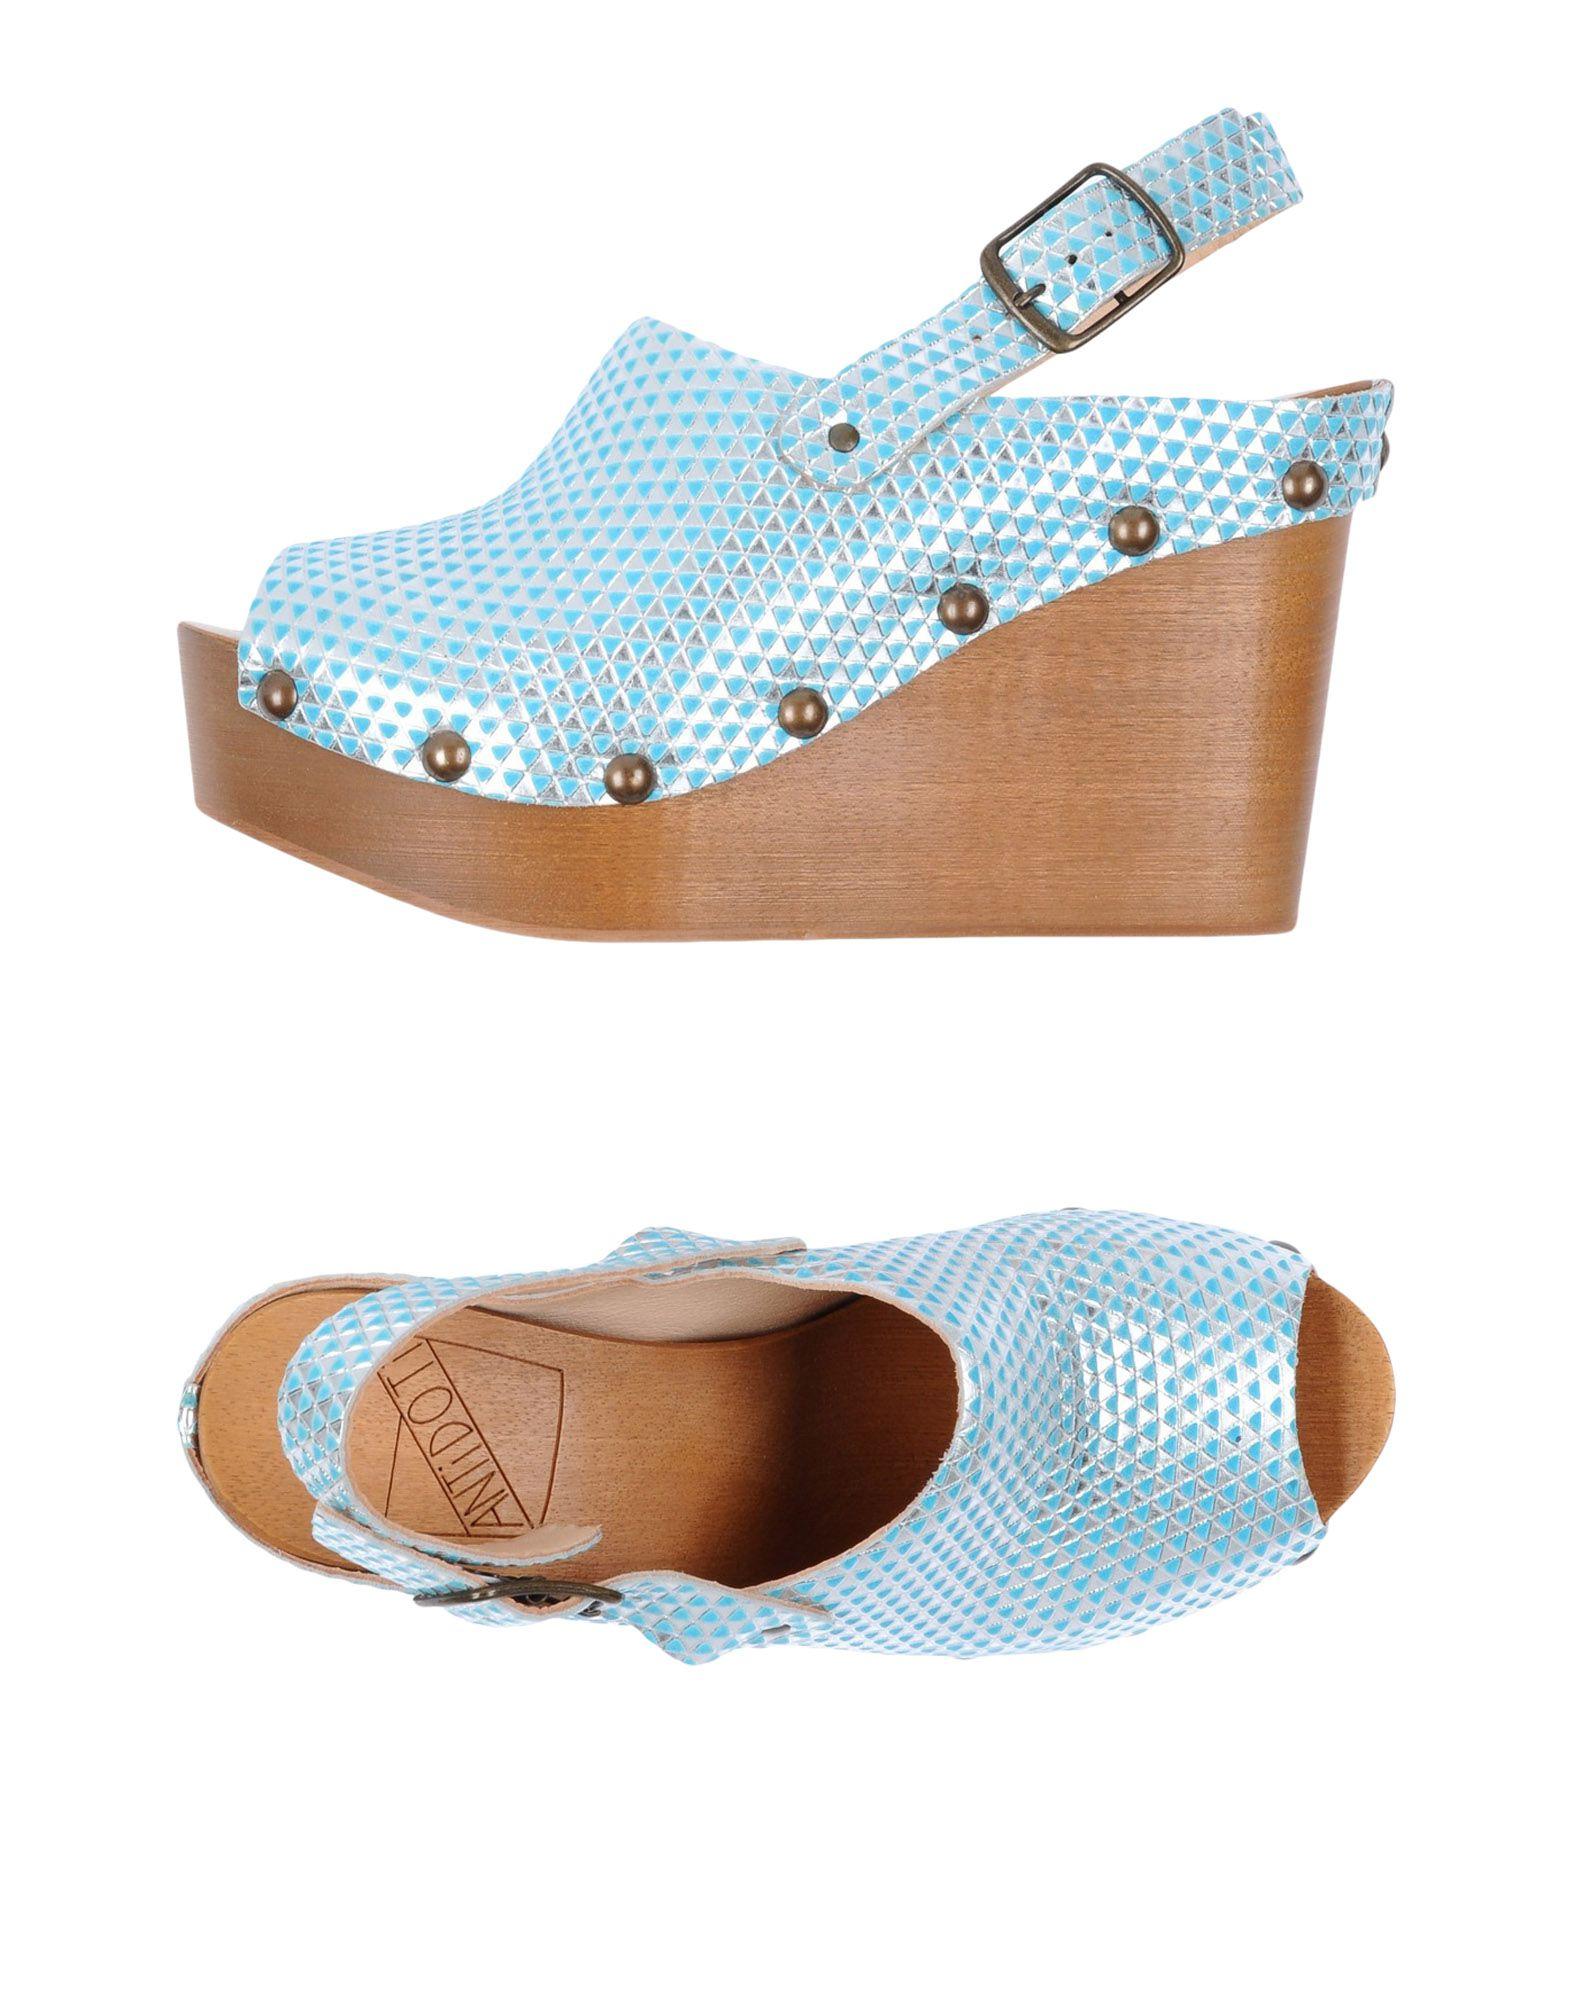 Moda Sandali Antidoti Donna Donna Antidoti - 11483776OK 62c931